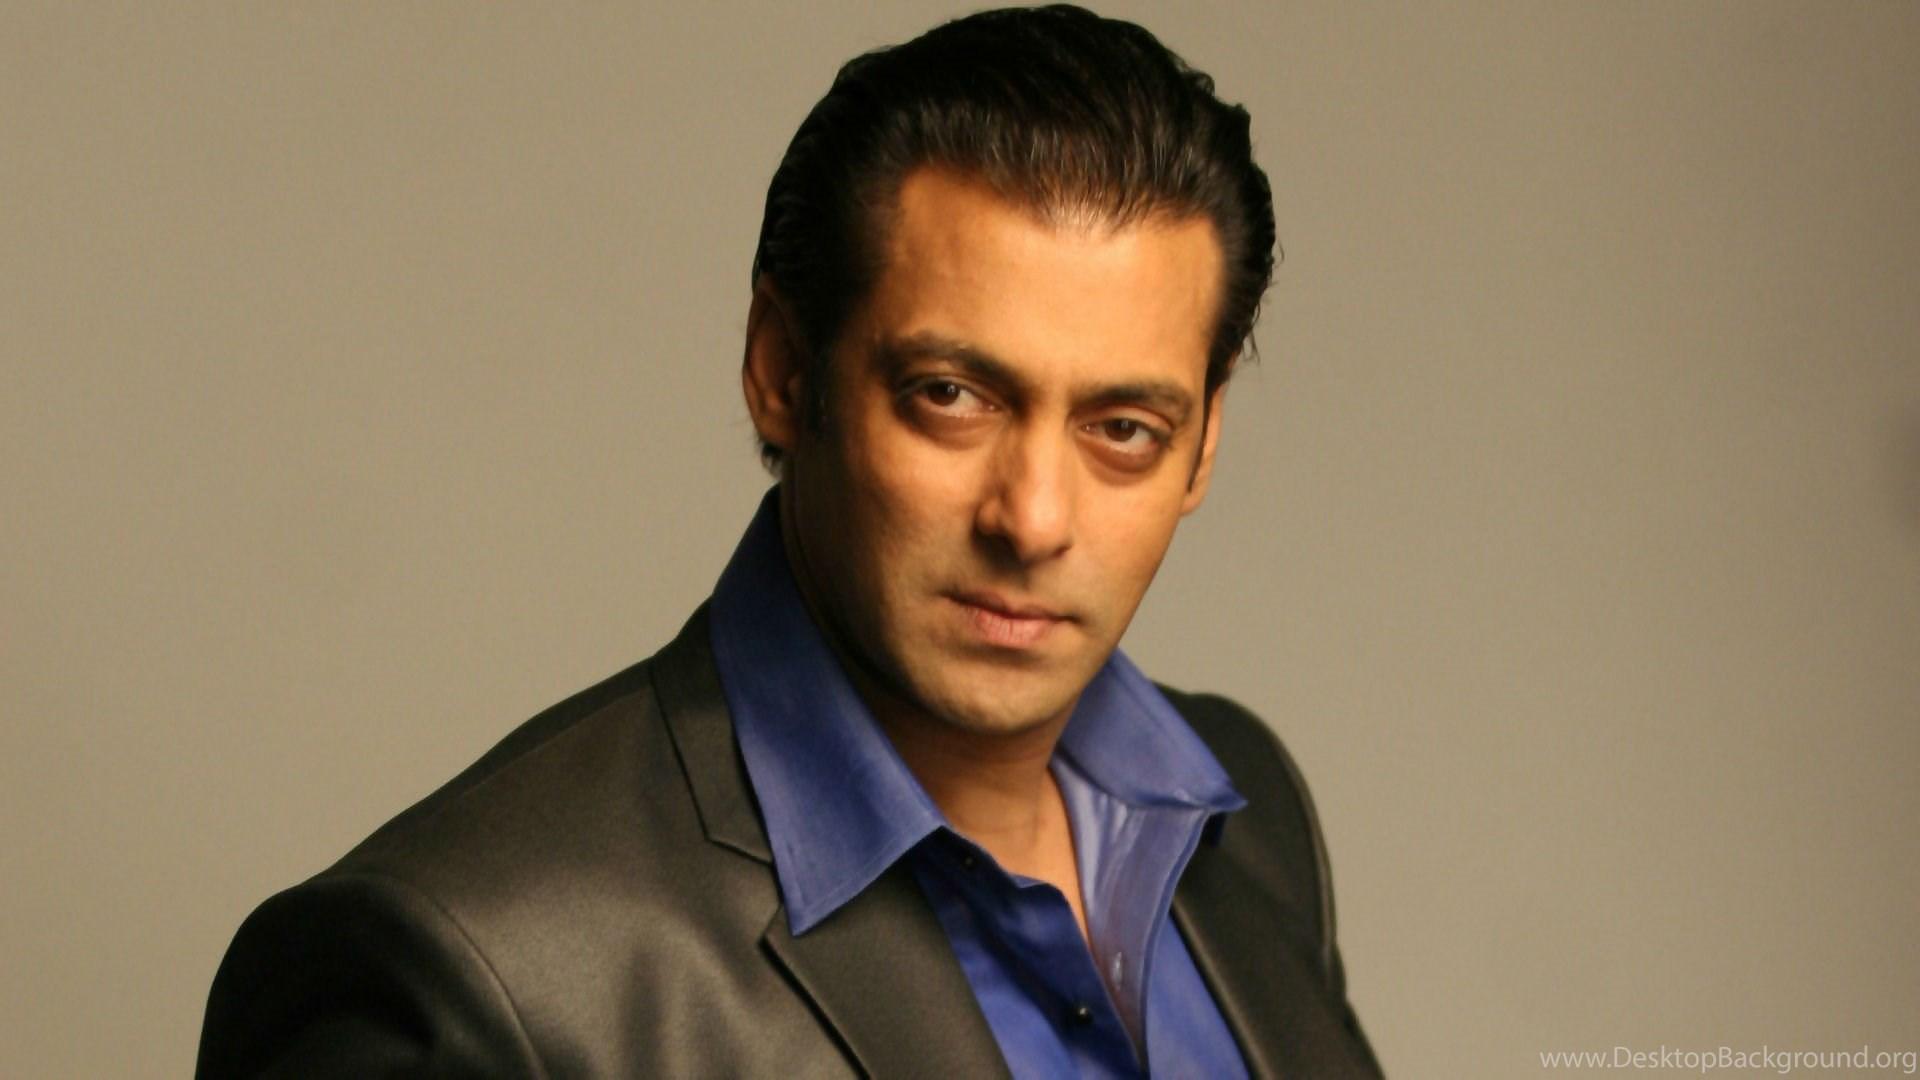 Salman Khan In Suit HD Wallpapers Desktop Background